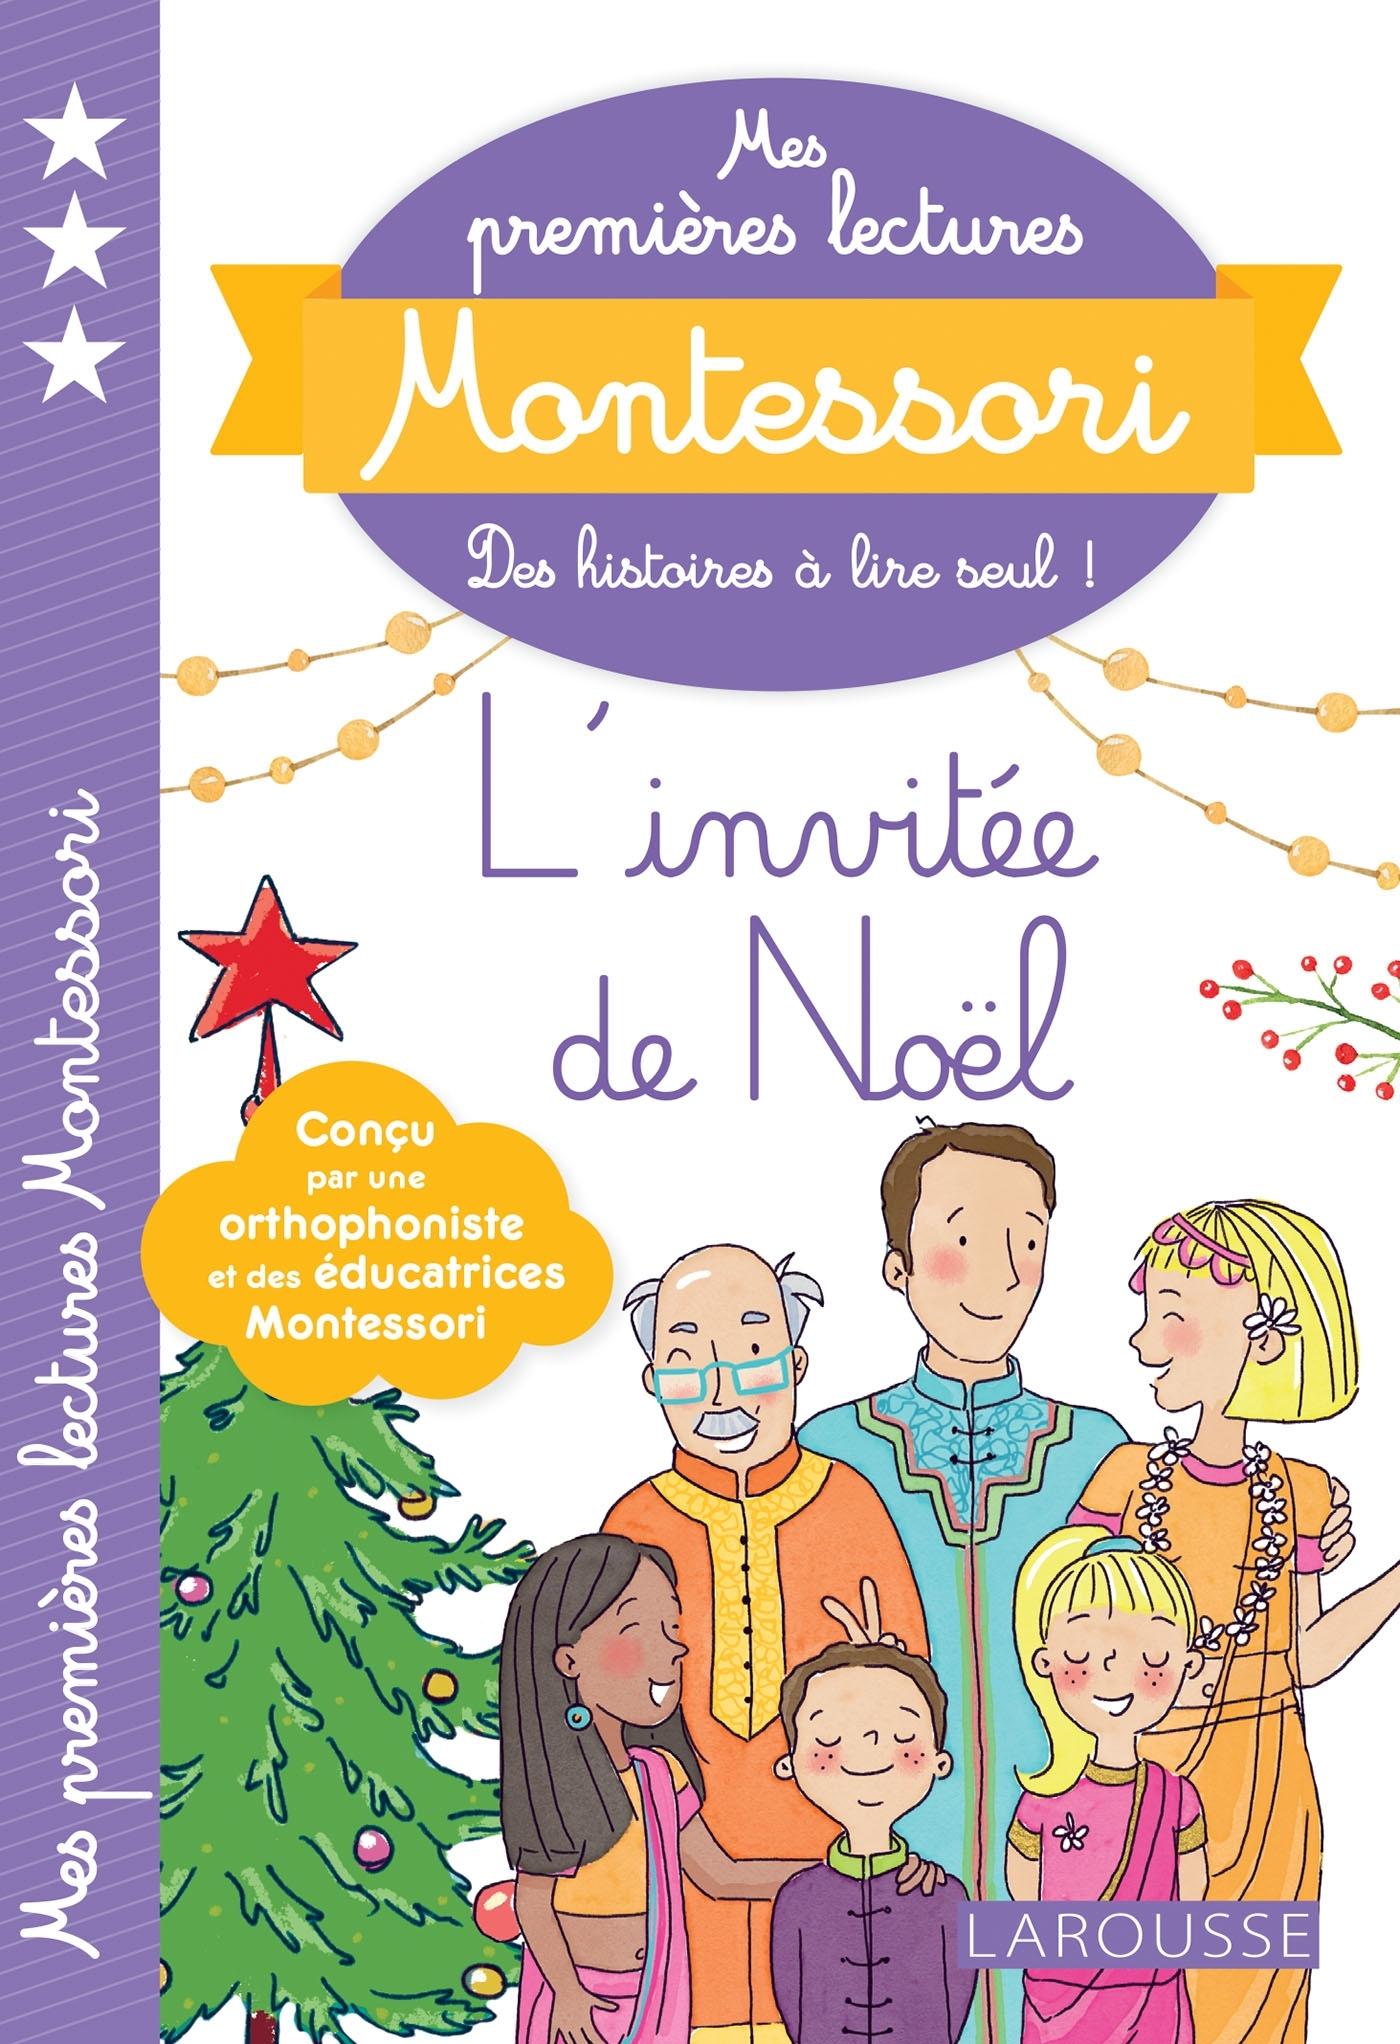 MES PREMIERES LECTURES MONTESSORI, L'INVITEE DE NOEL